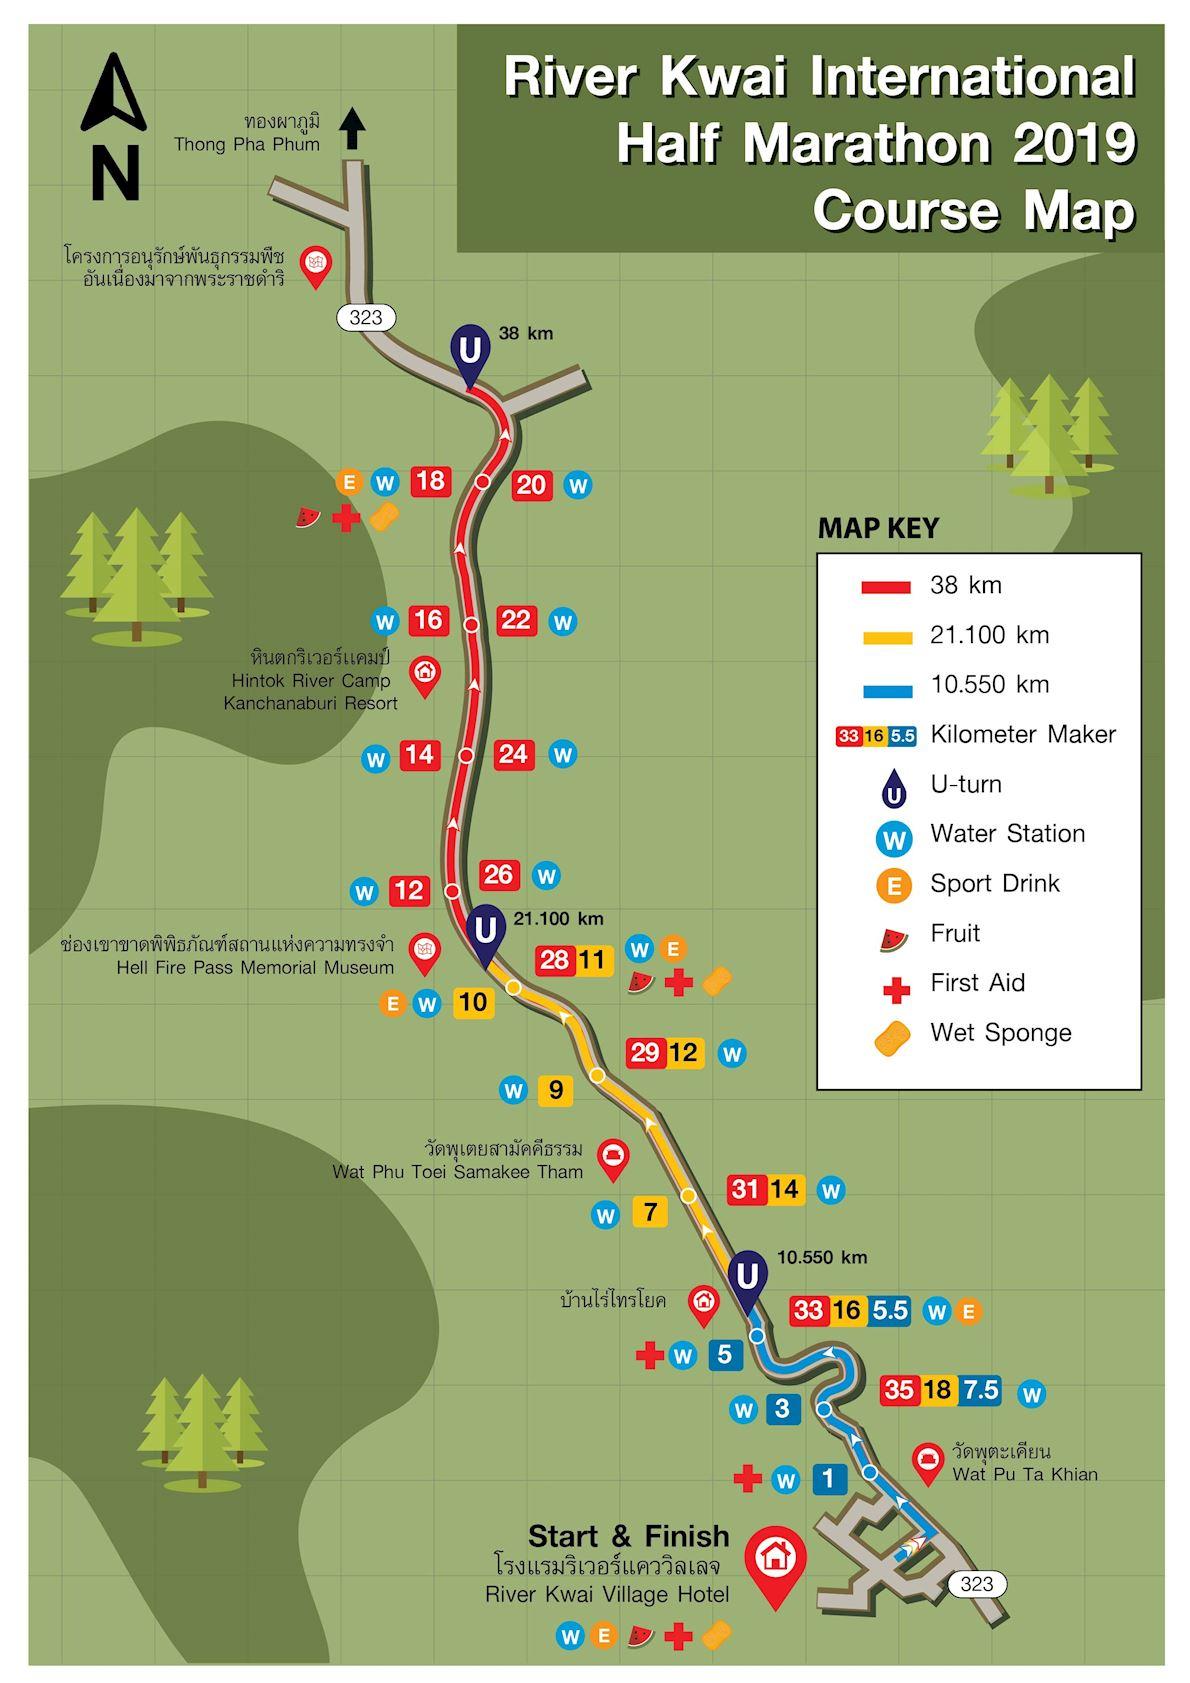 River Kwai International Half Marathon Route Map